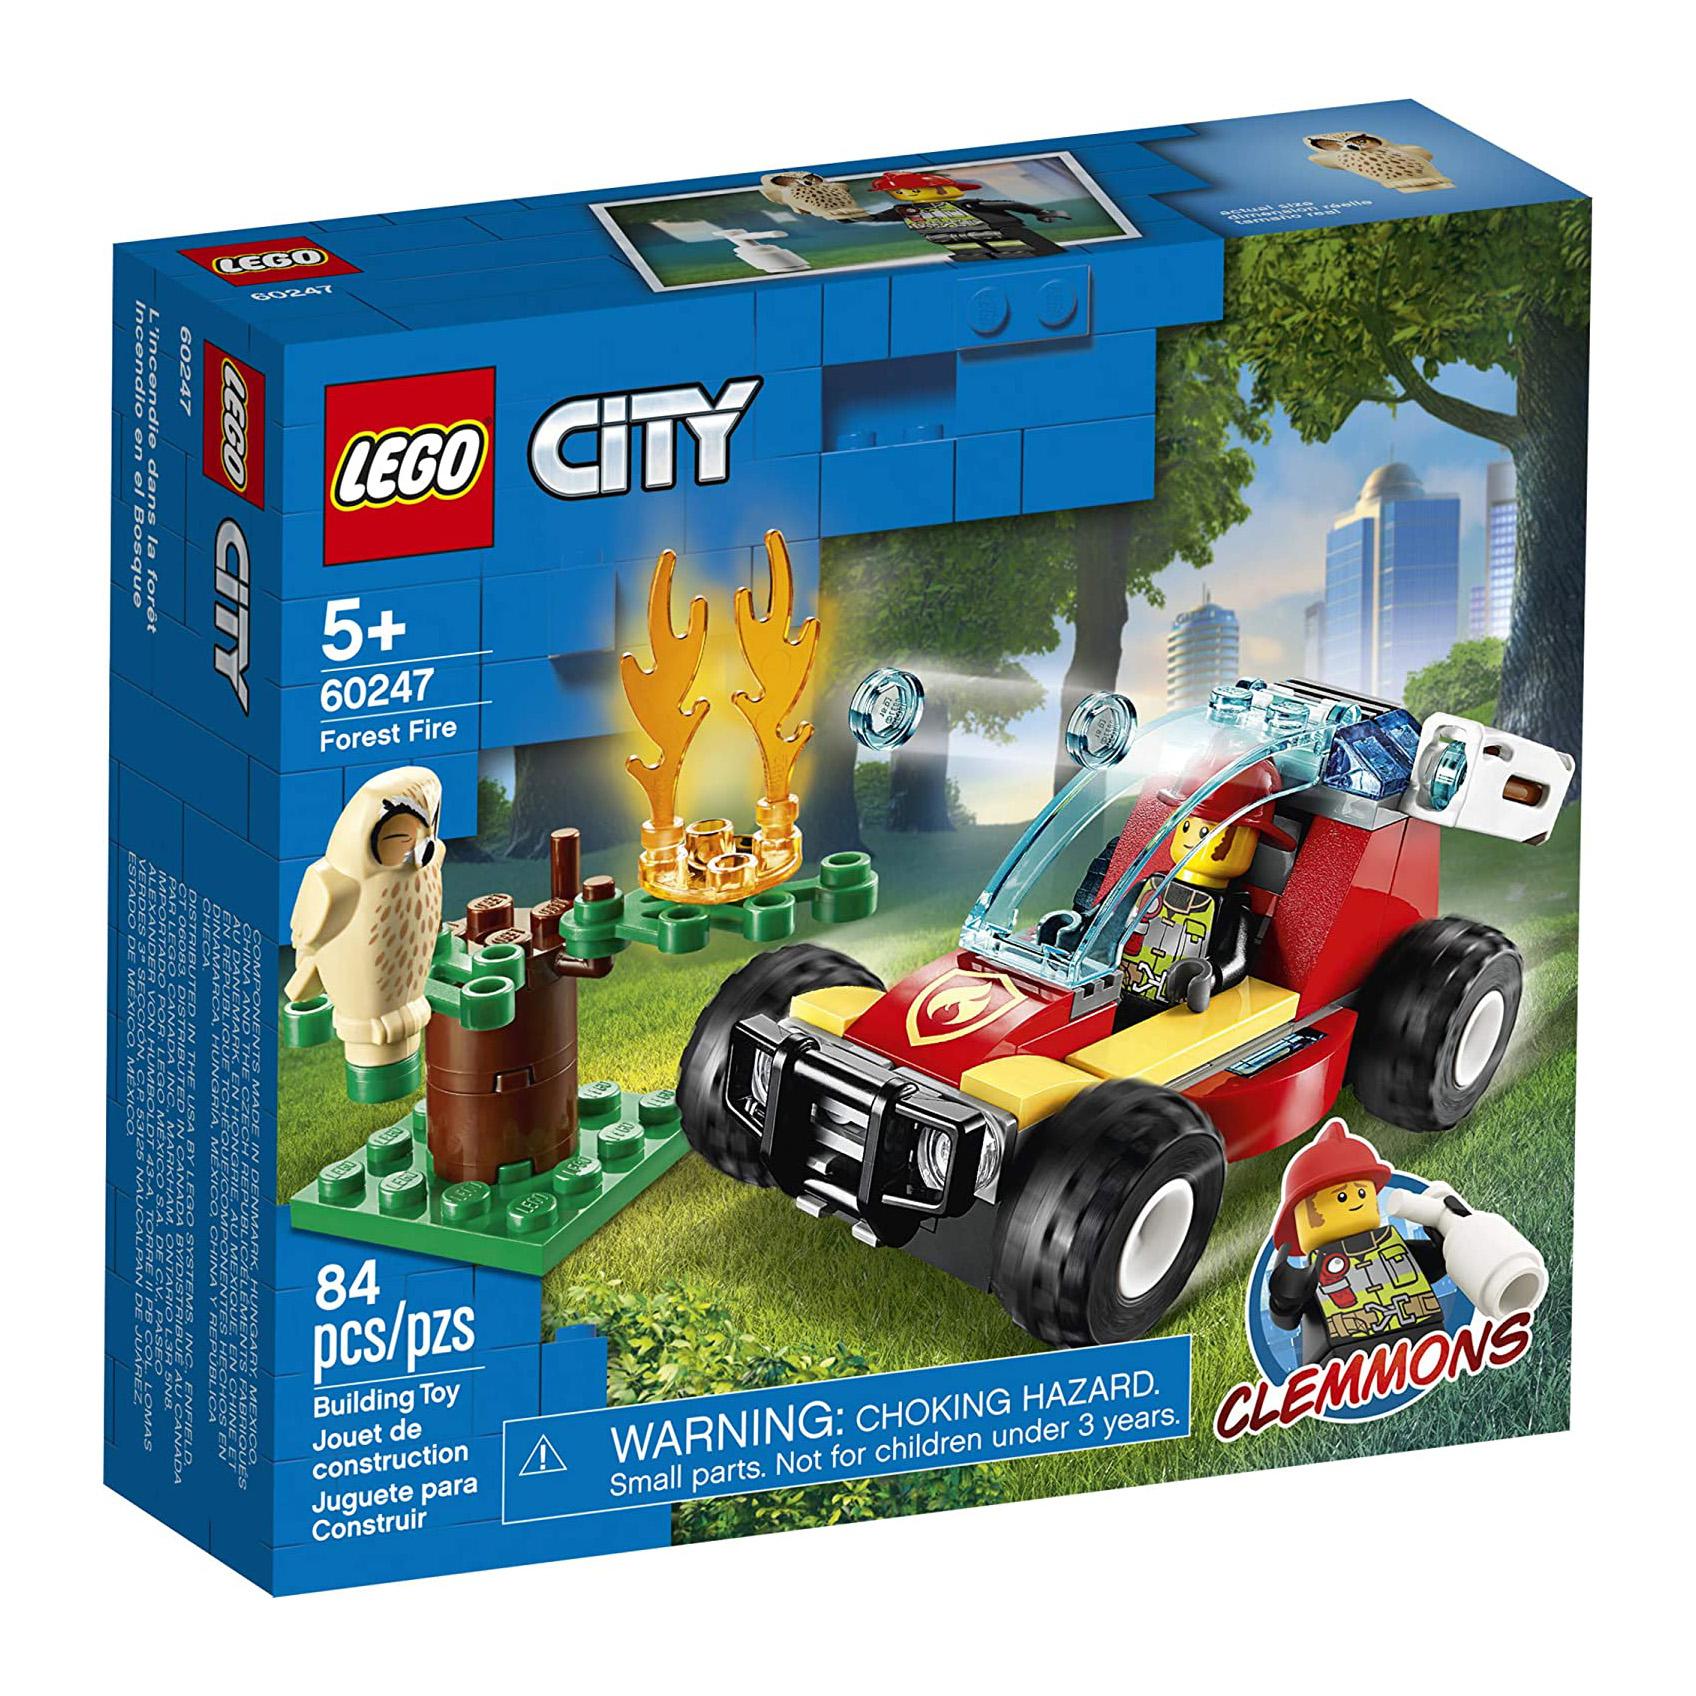 لگو مدل city 60247